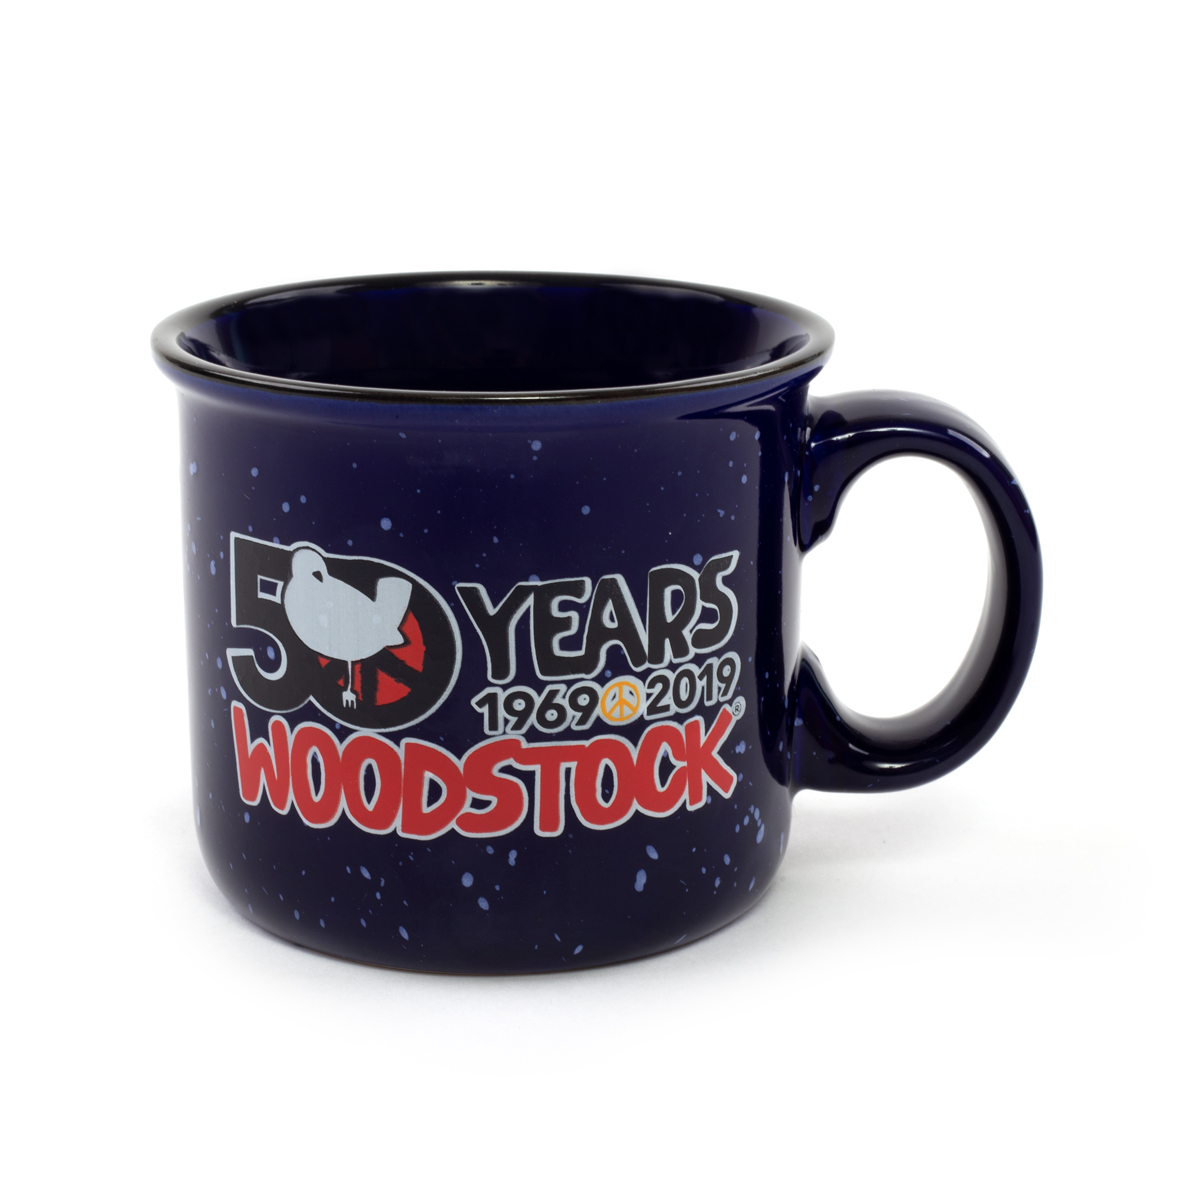 50 Years of Woodstock 1969-2019 Camp Mug